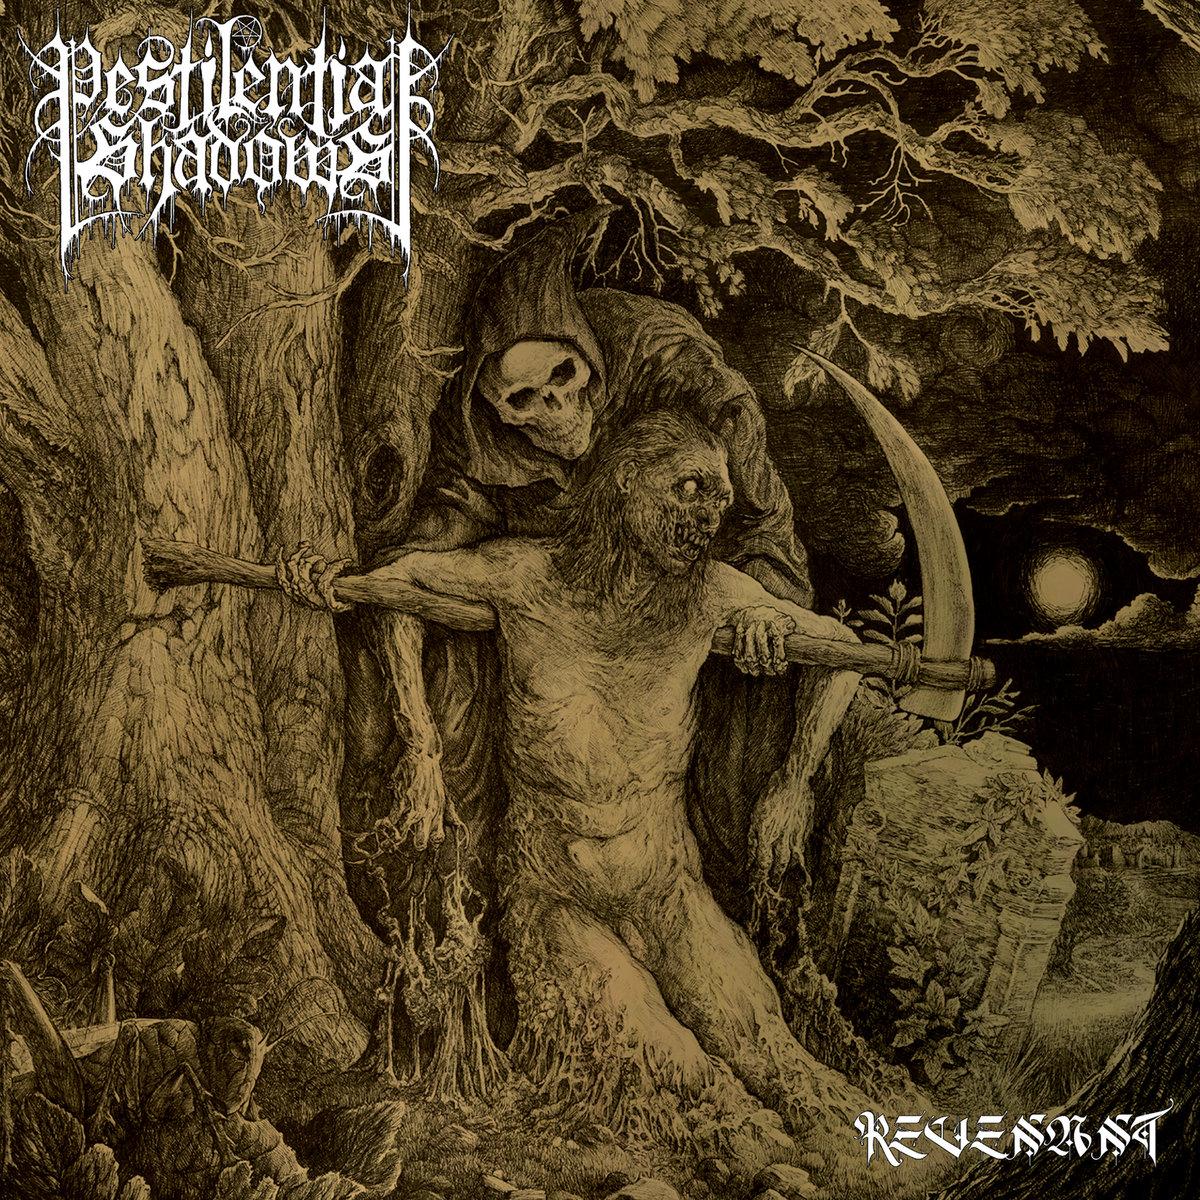 PESTILENTIEL SHADOWS Revenant (2021) Black Metal Australie A1419410